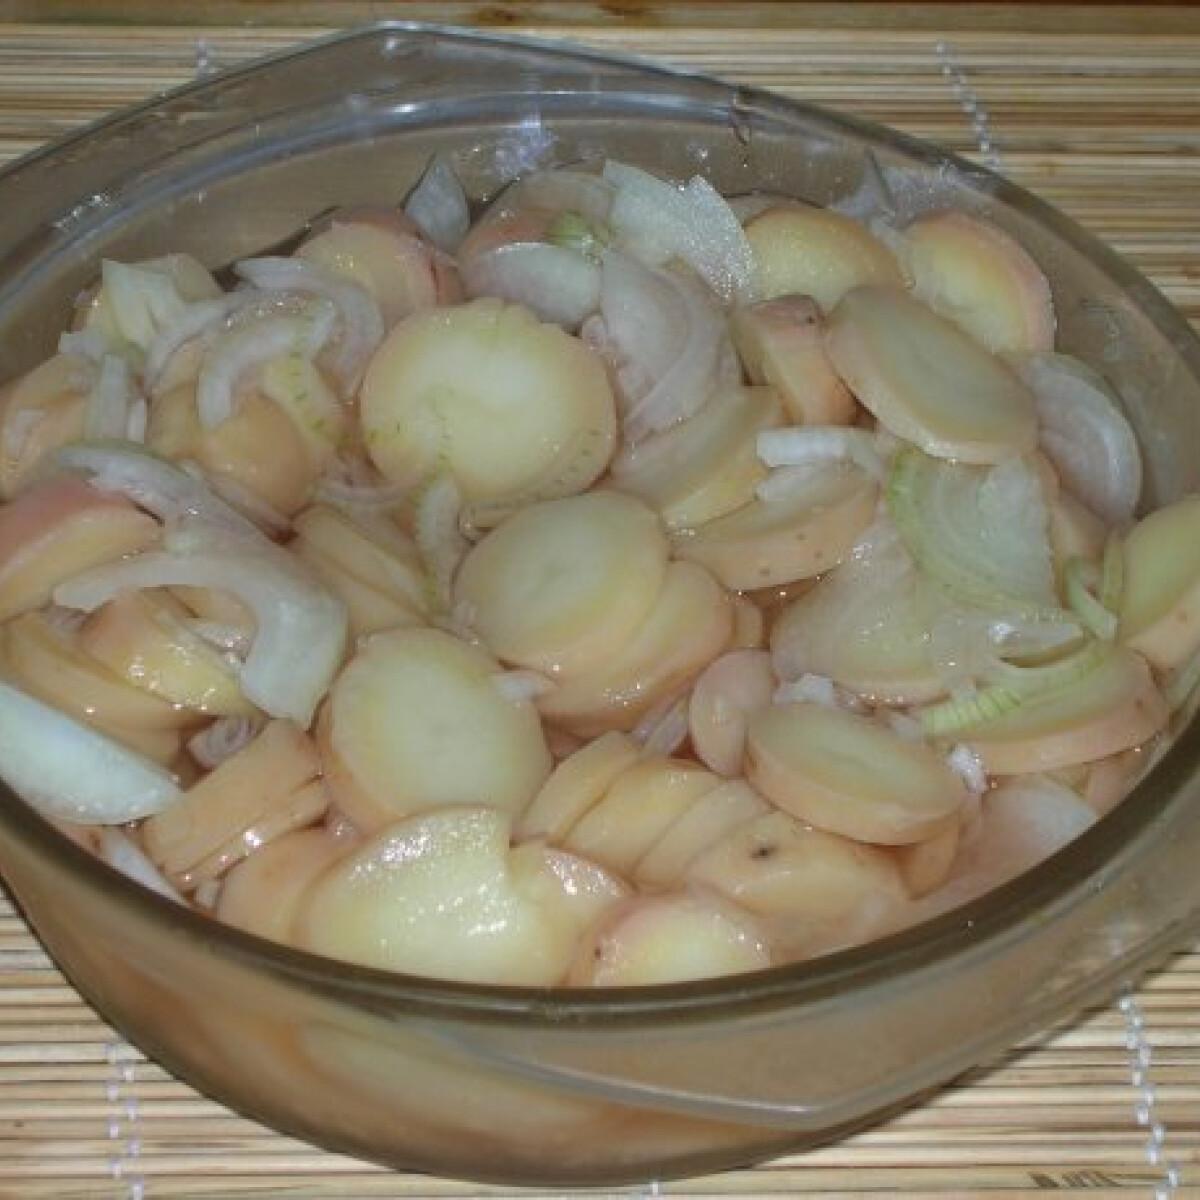 Ecetes krumplisaláta